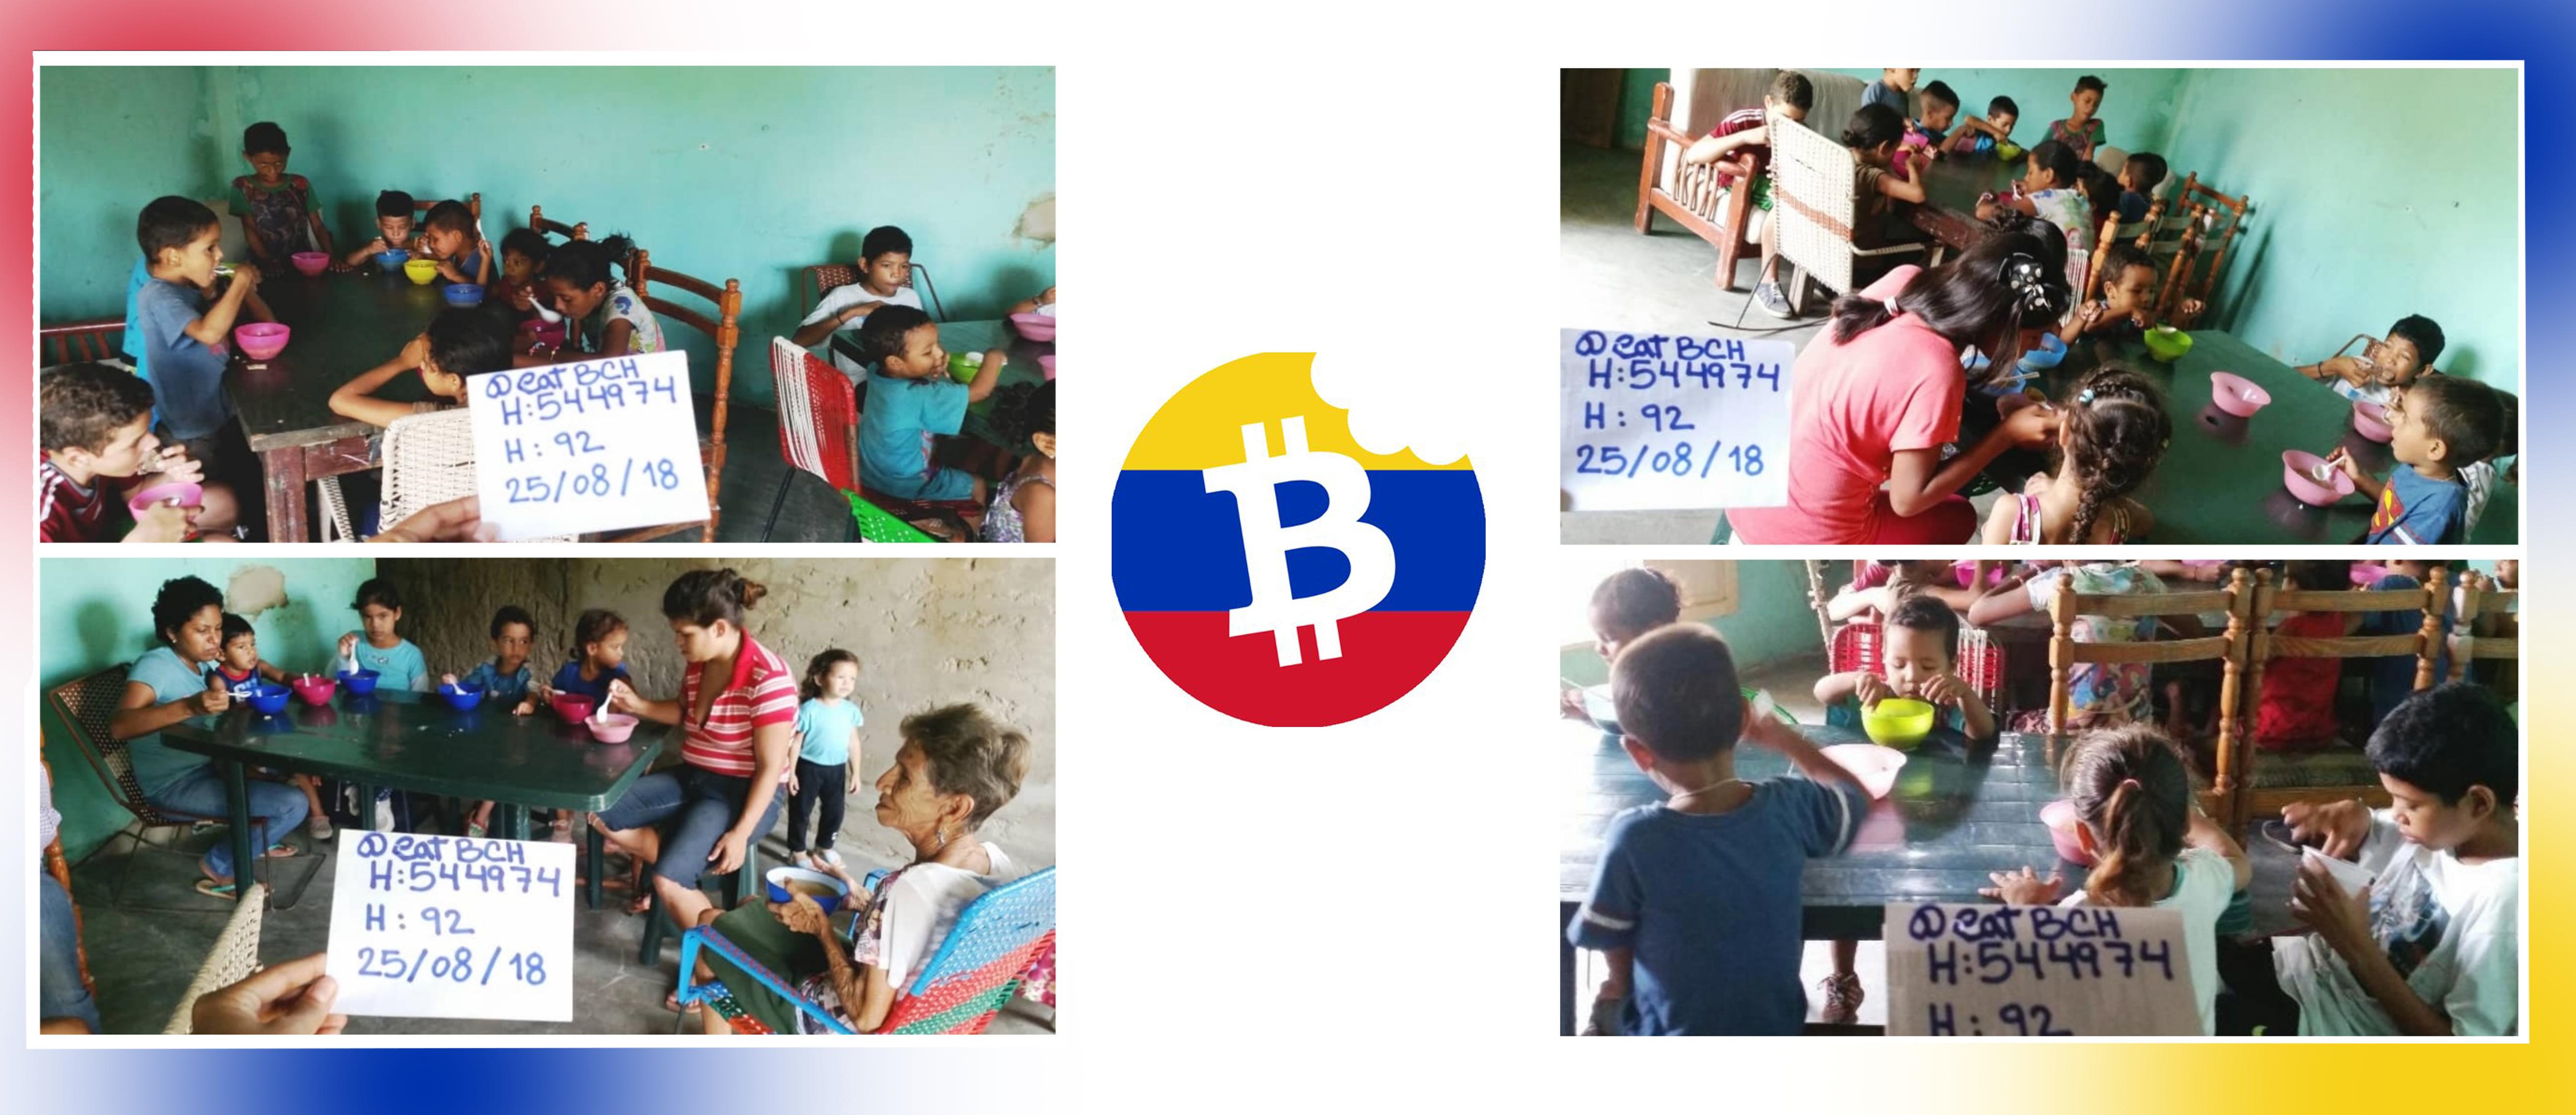 Venezuelan Nonprofit Eatbch Celebrates First Anniversary Amidst Hyperinflation